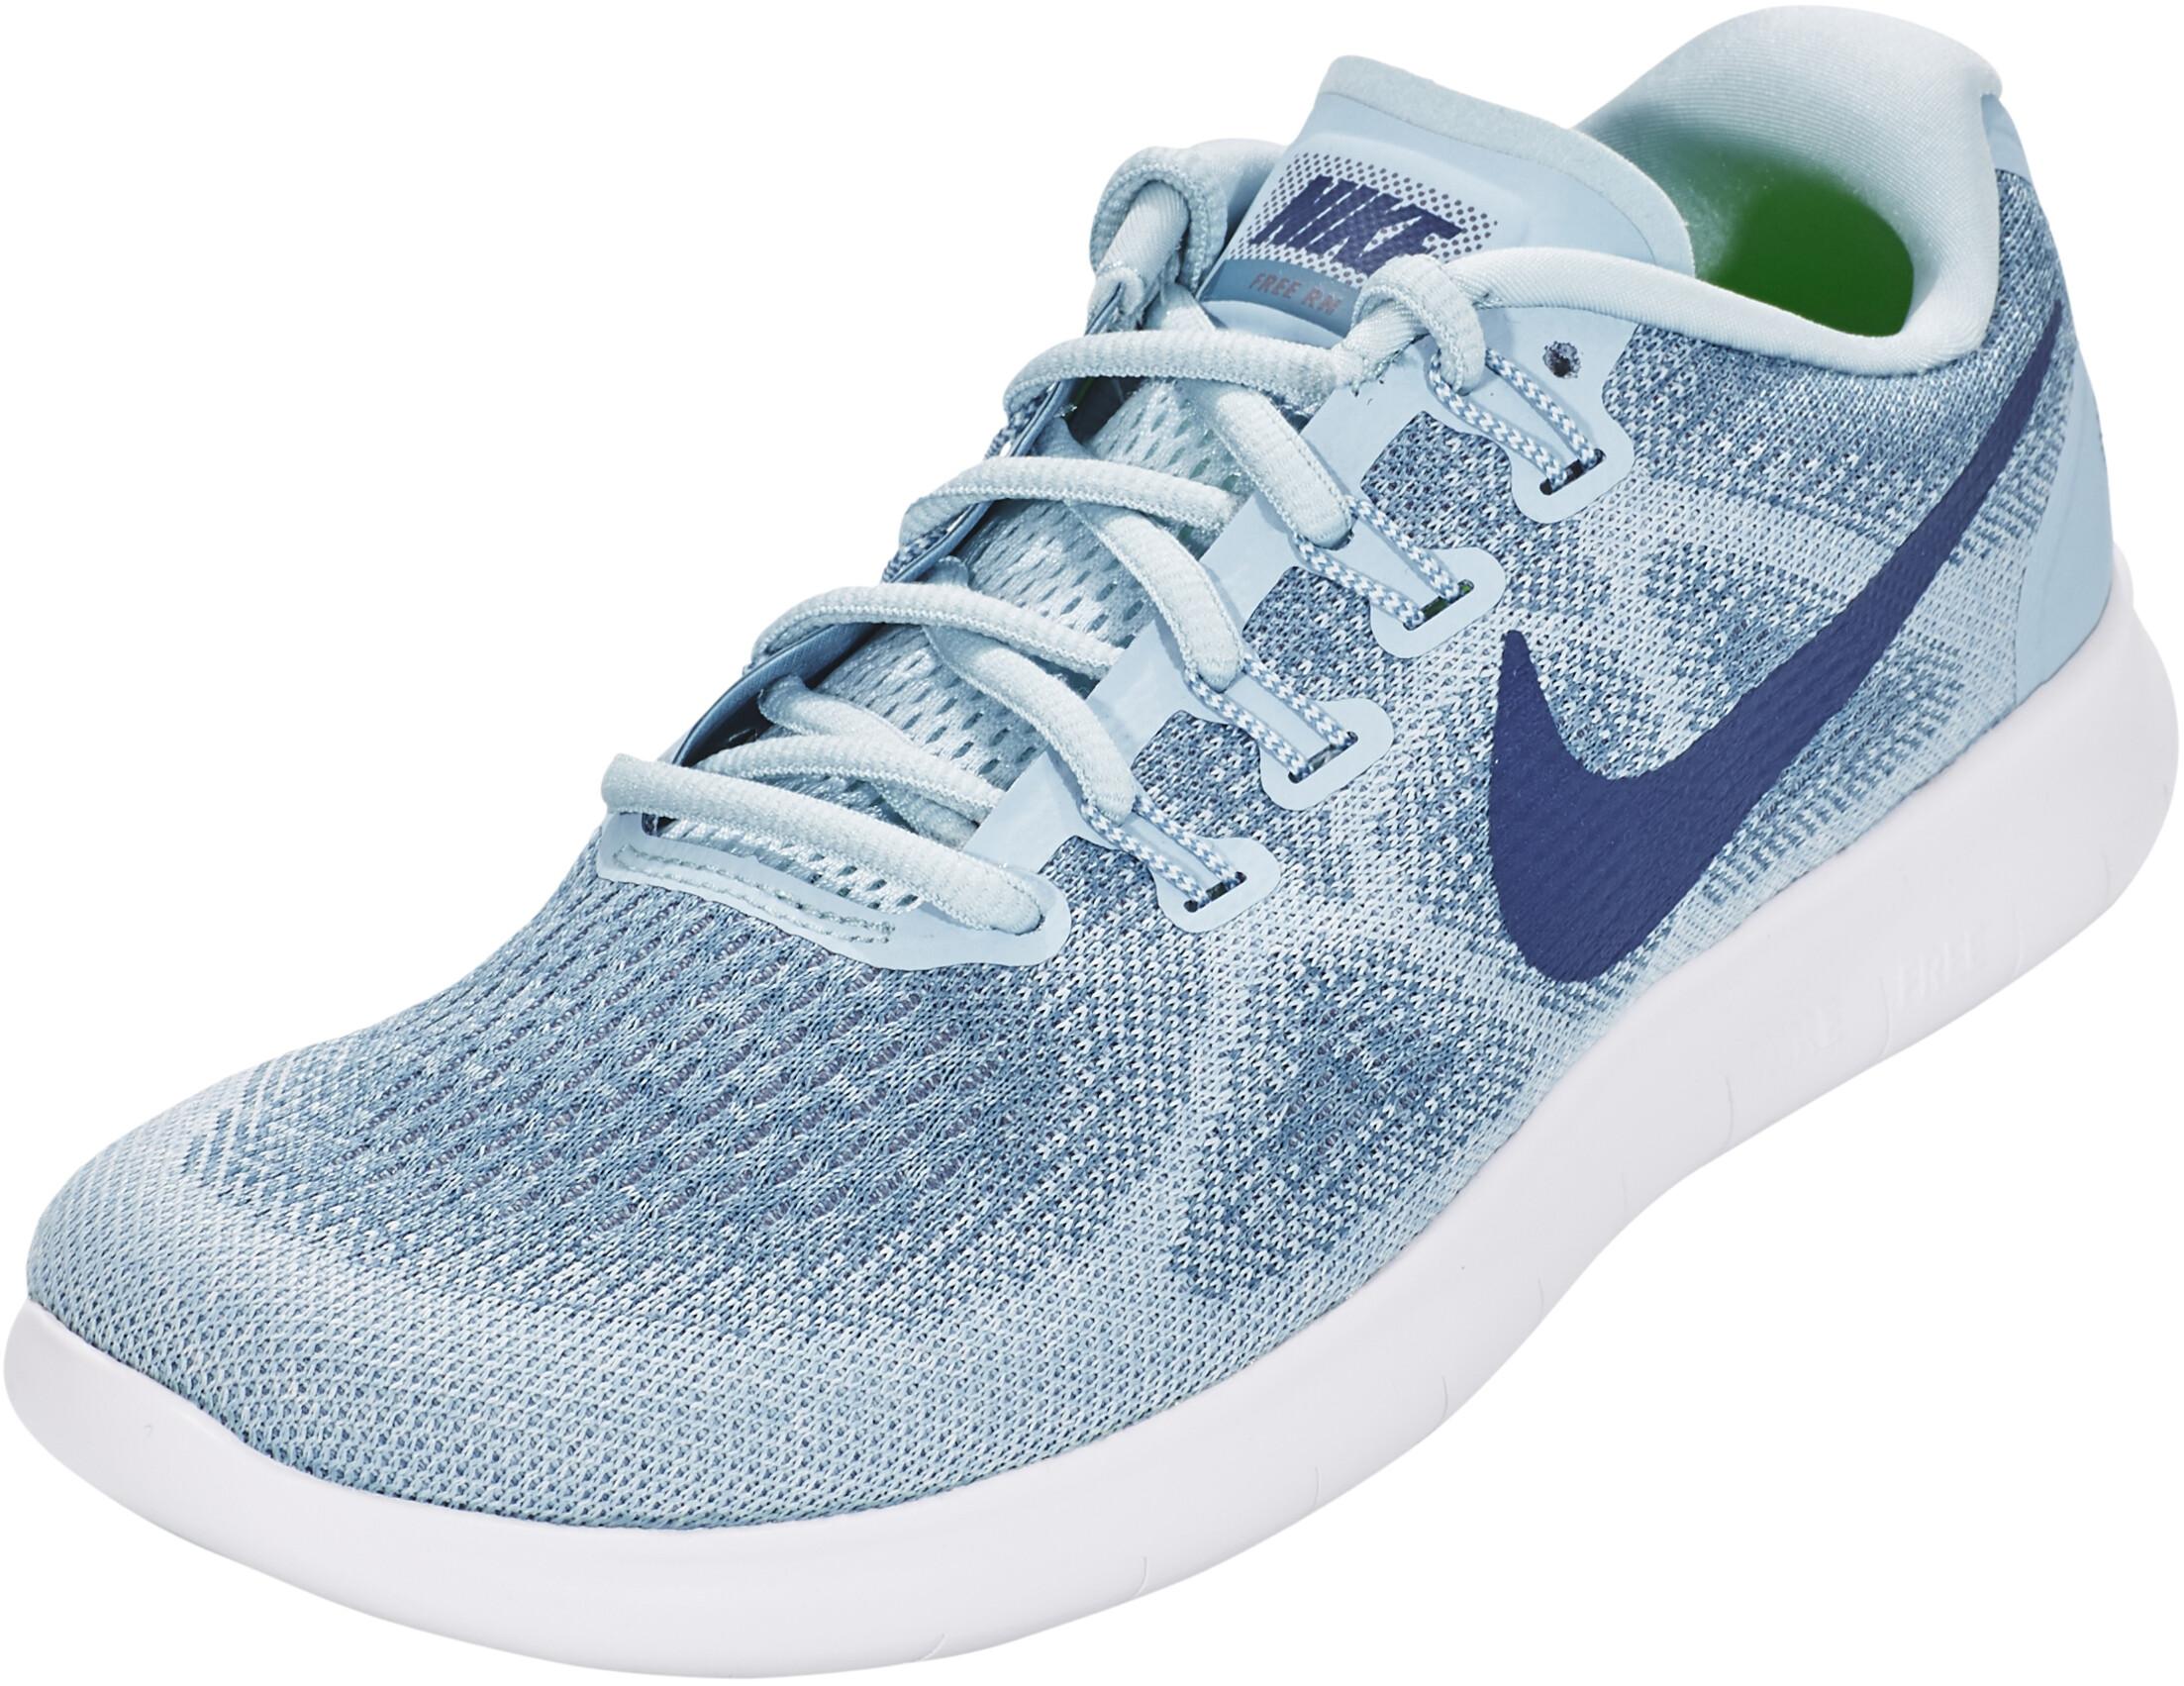 Nike Shoes Women Aqua Pearl